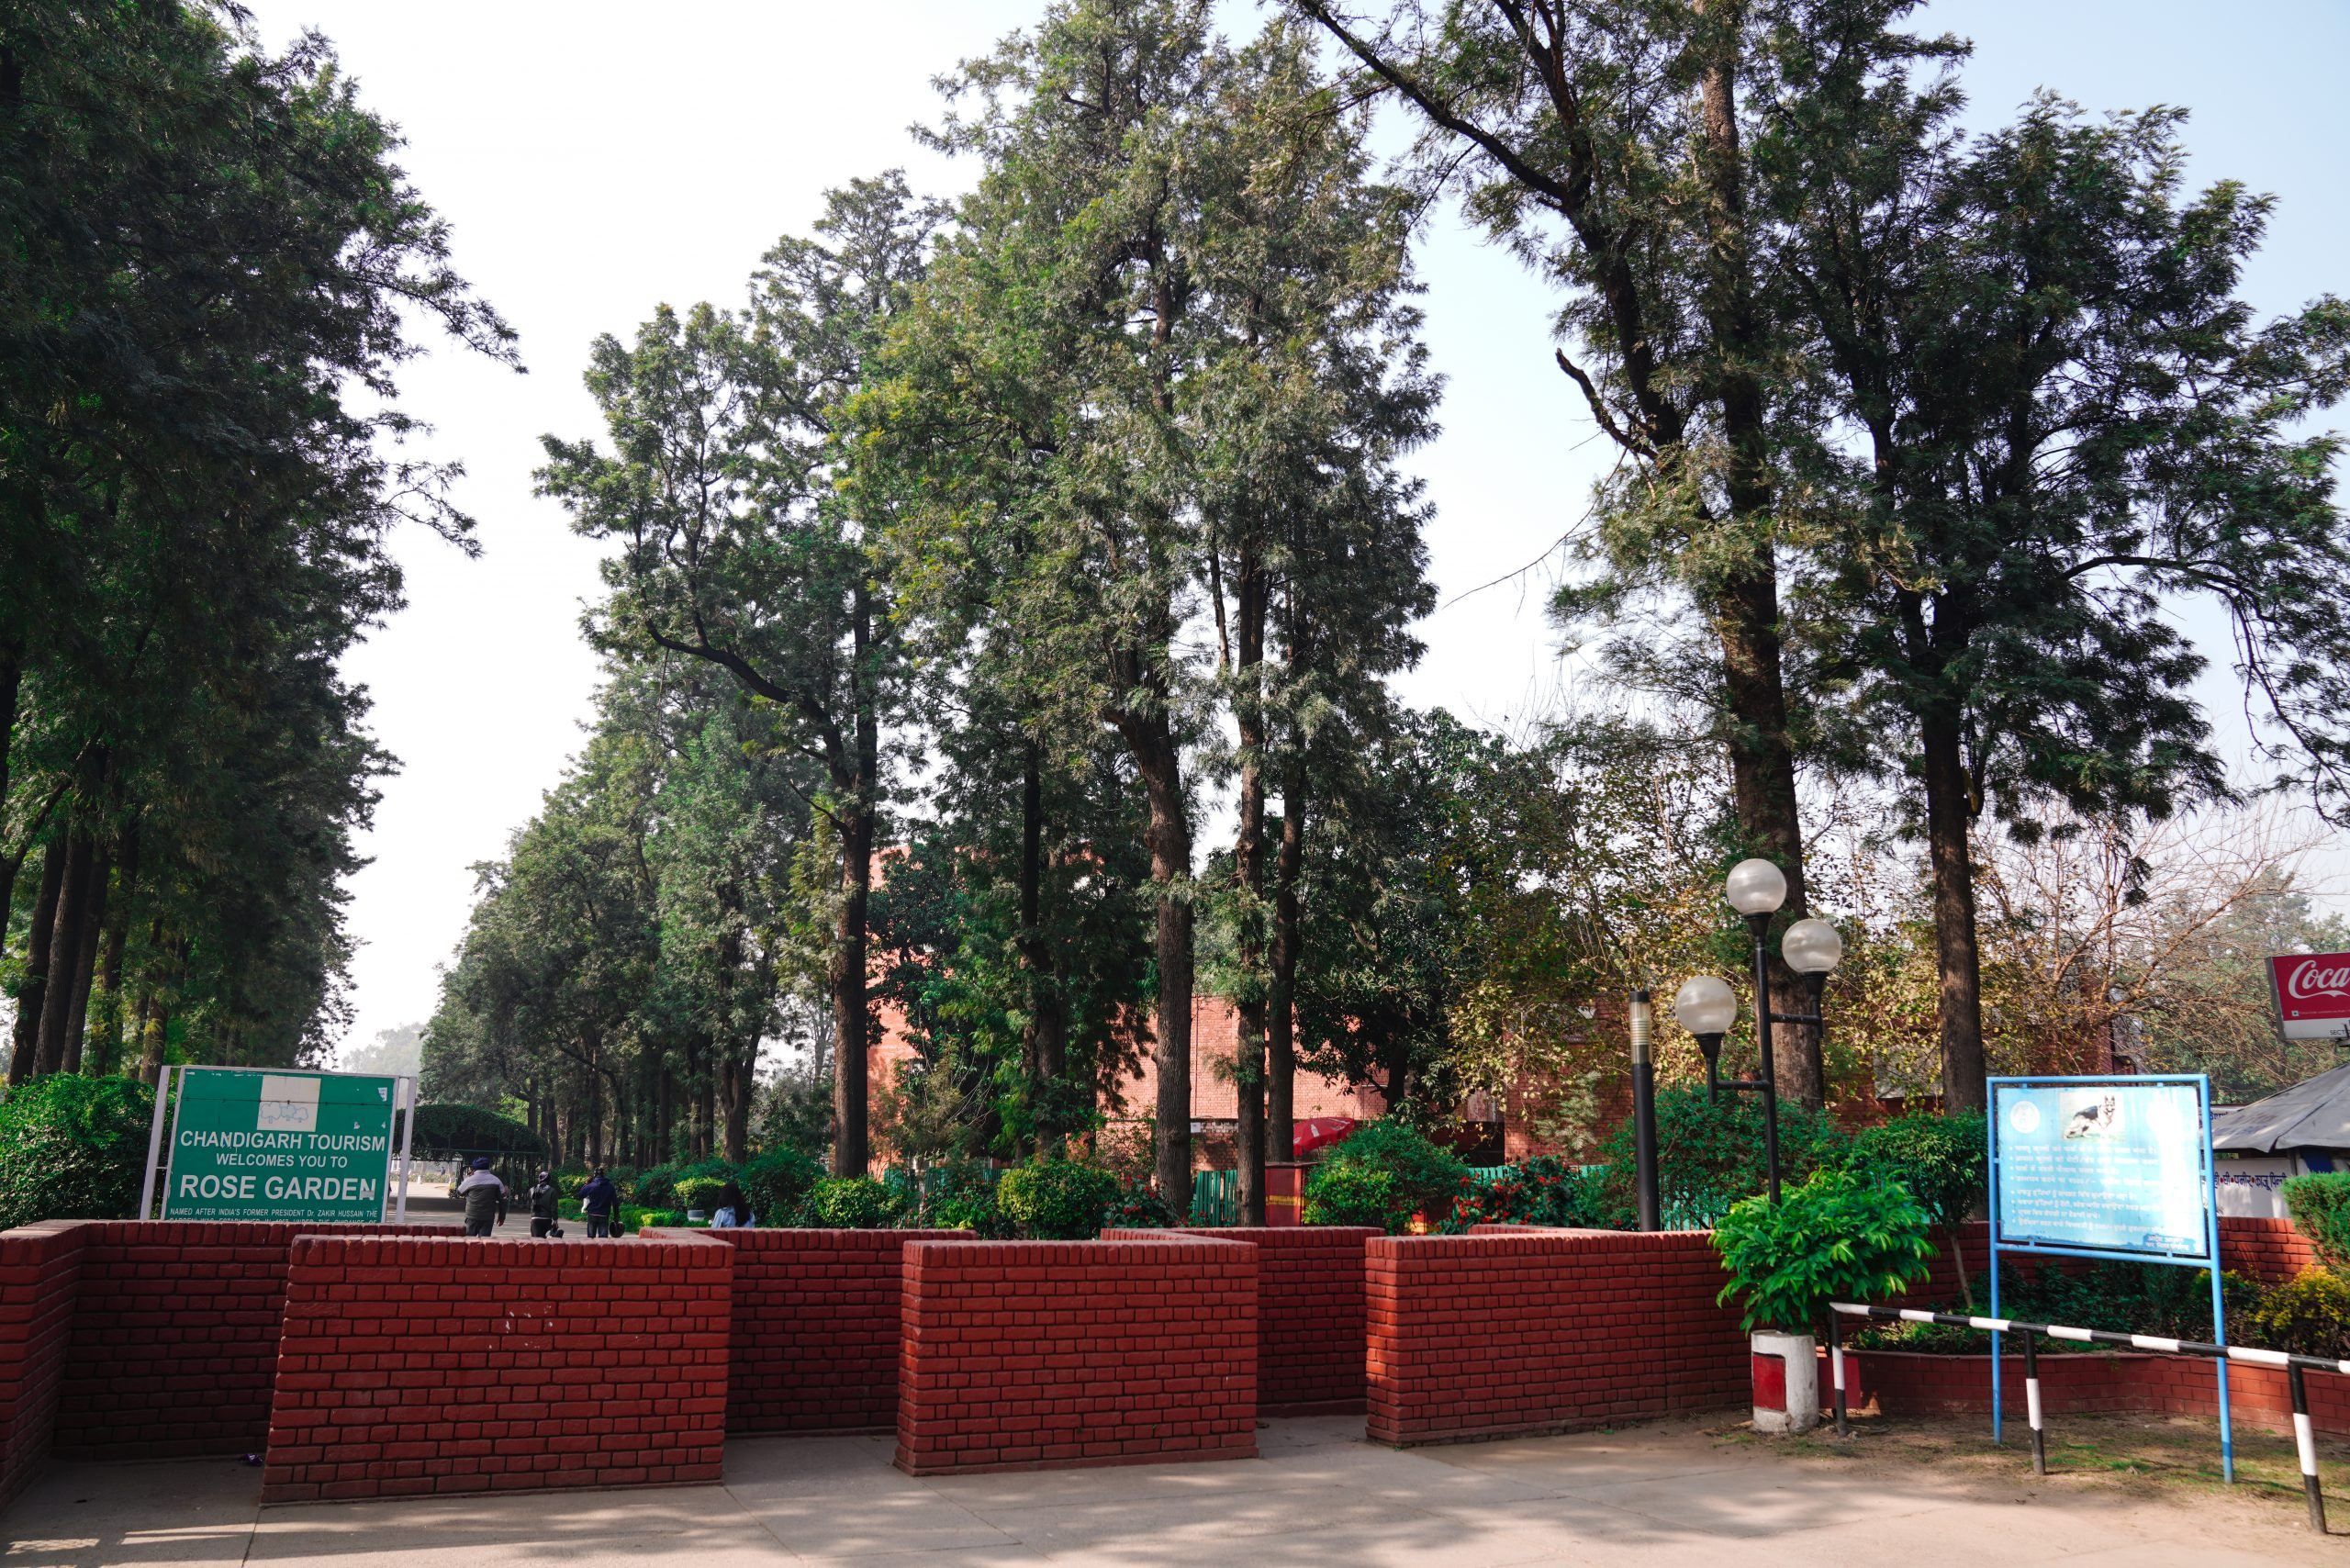 Entrance of Rose garden in Chandigarh